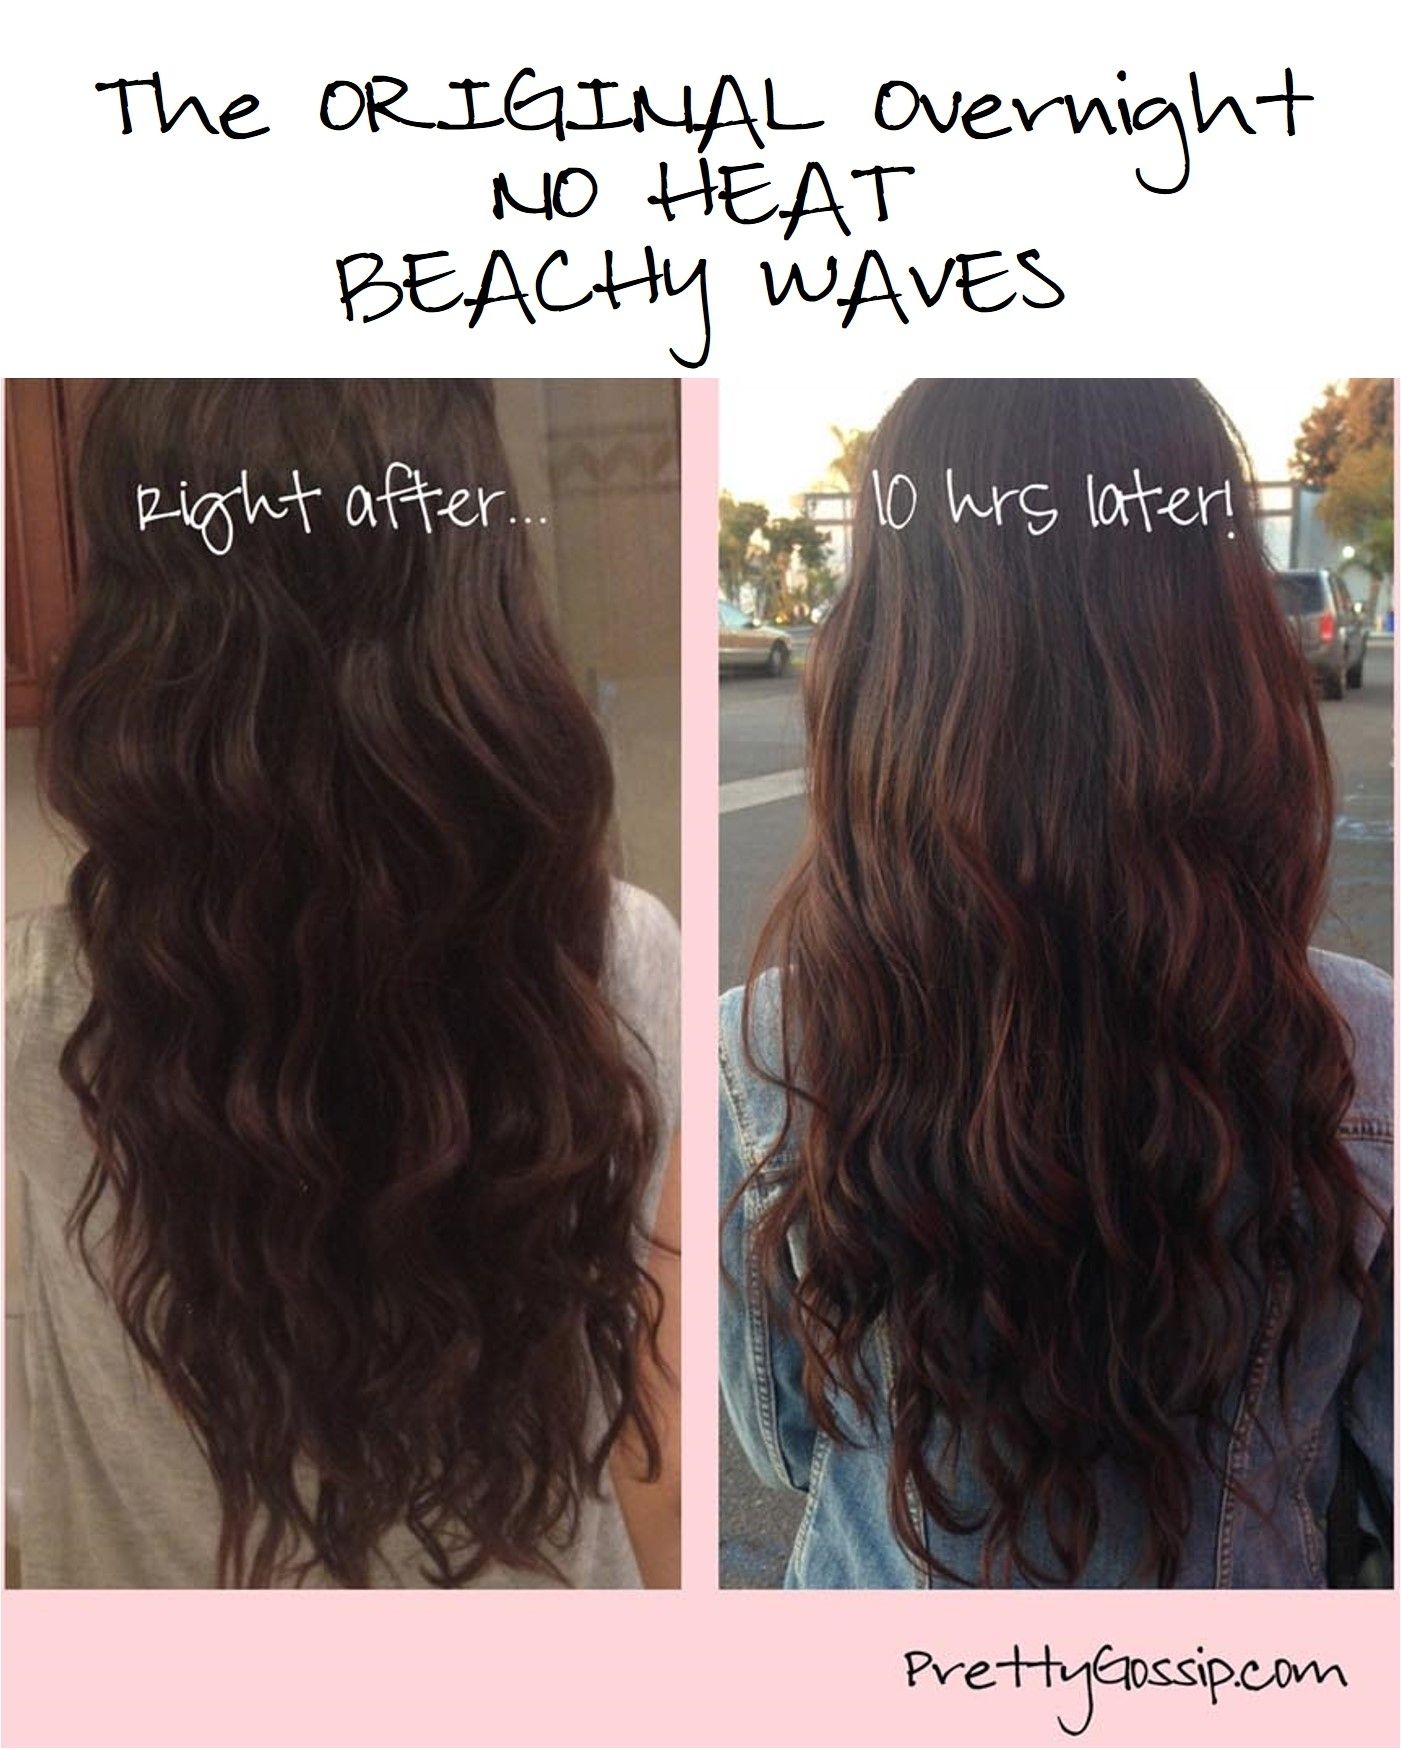 How To Keep Hair Straight Overnight Cuteandeasyhairstyles Net Long Hair Waves Beach Waves For Short Hair Curl Hair Overnight